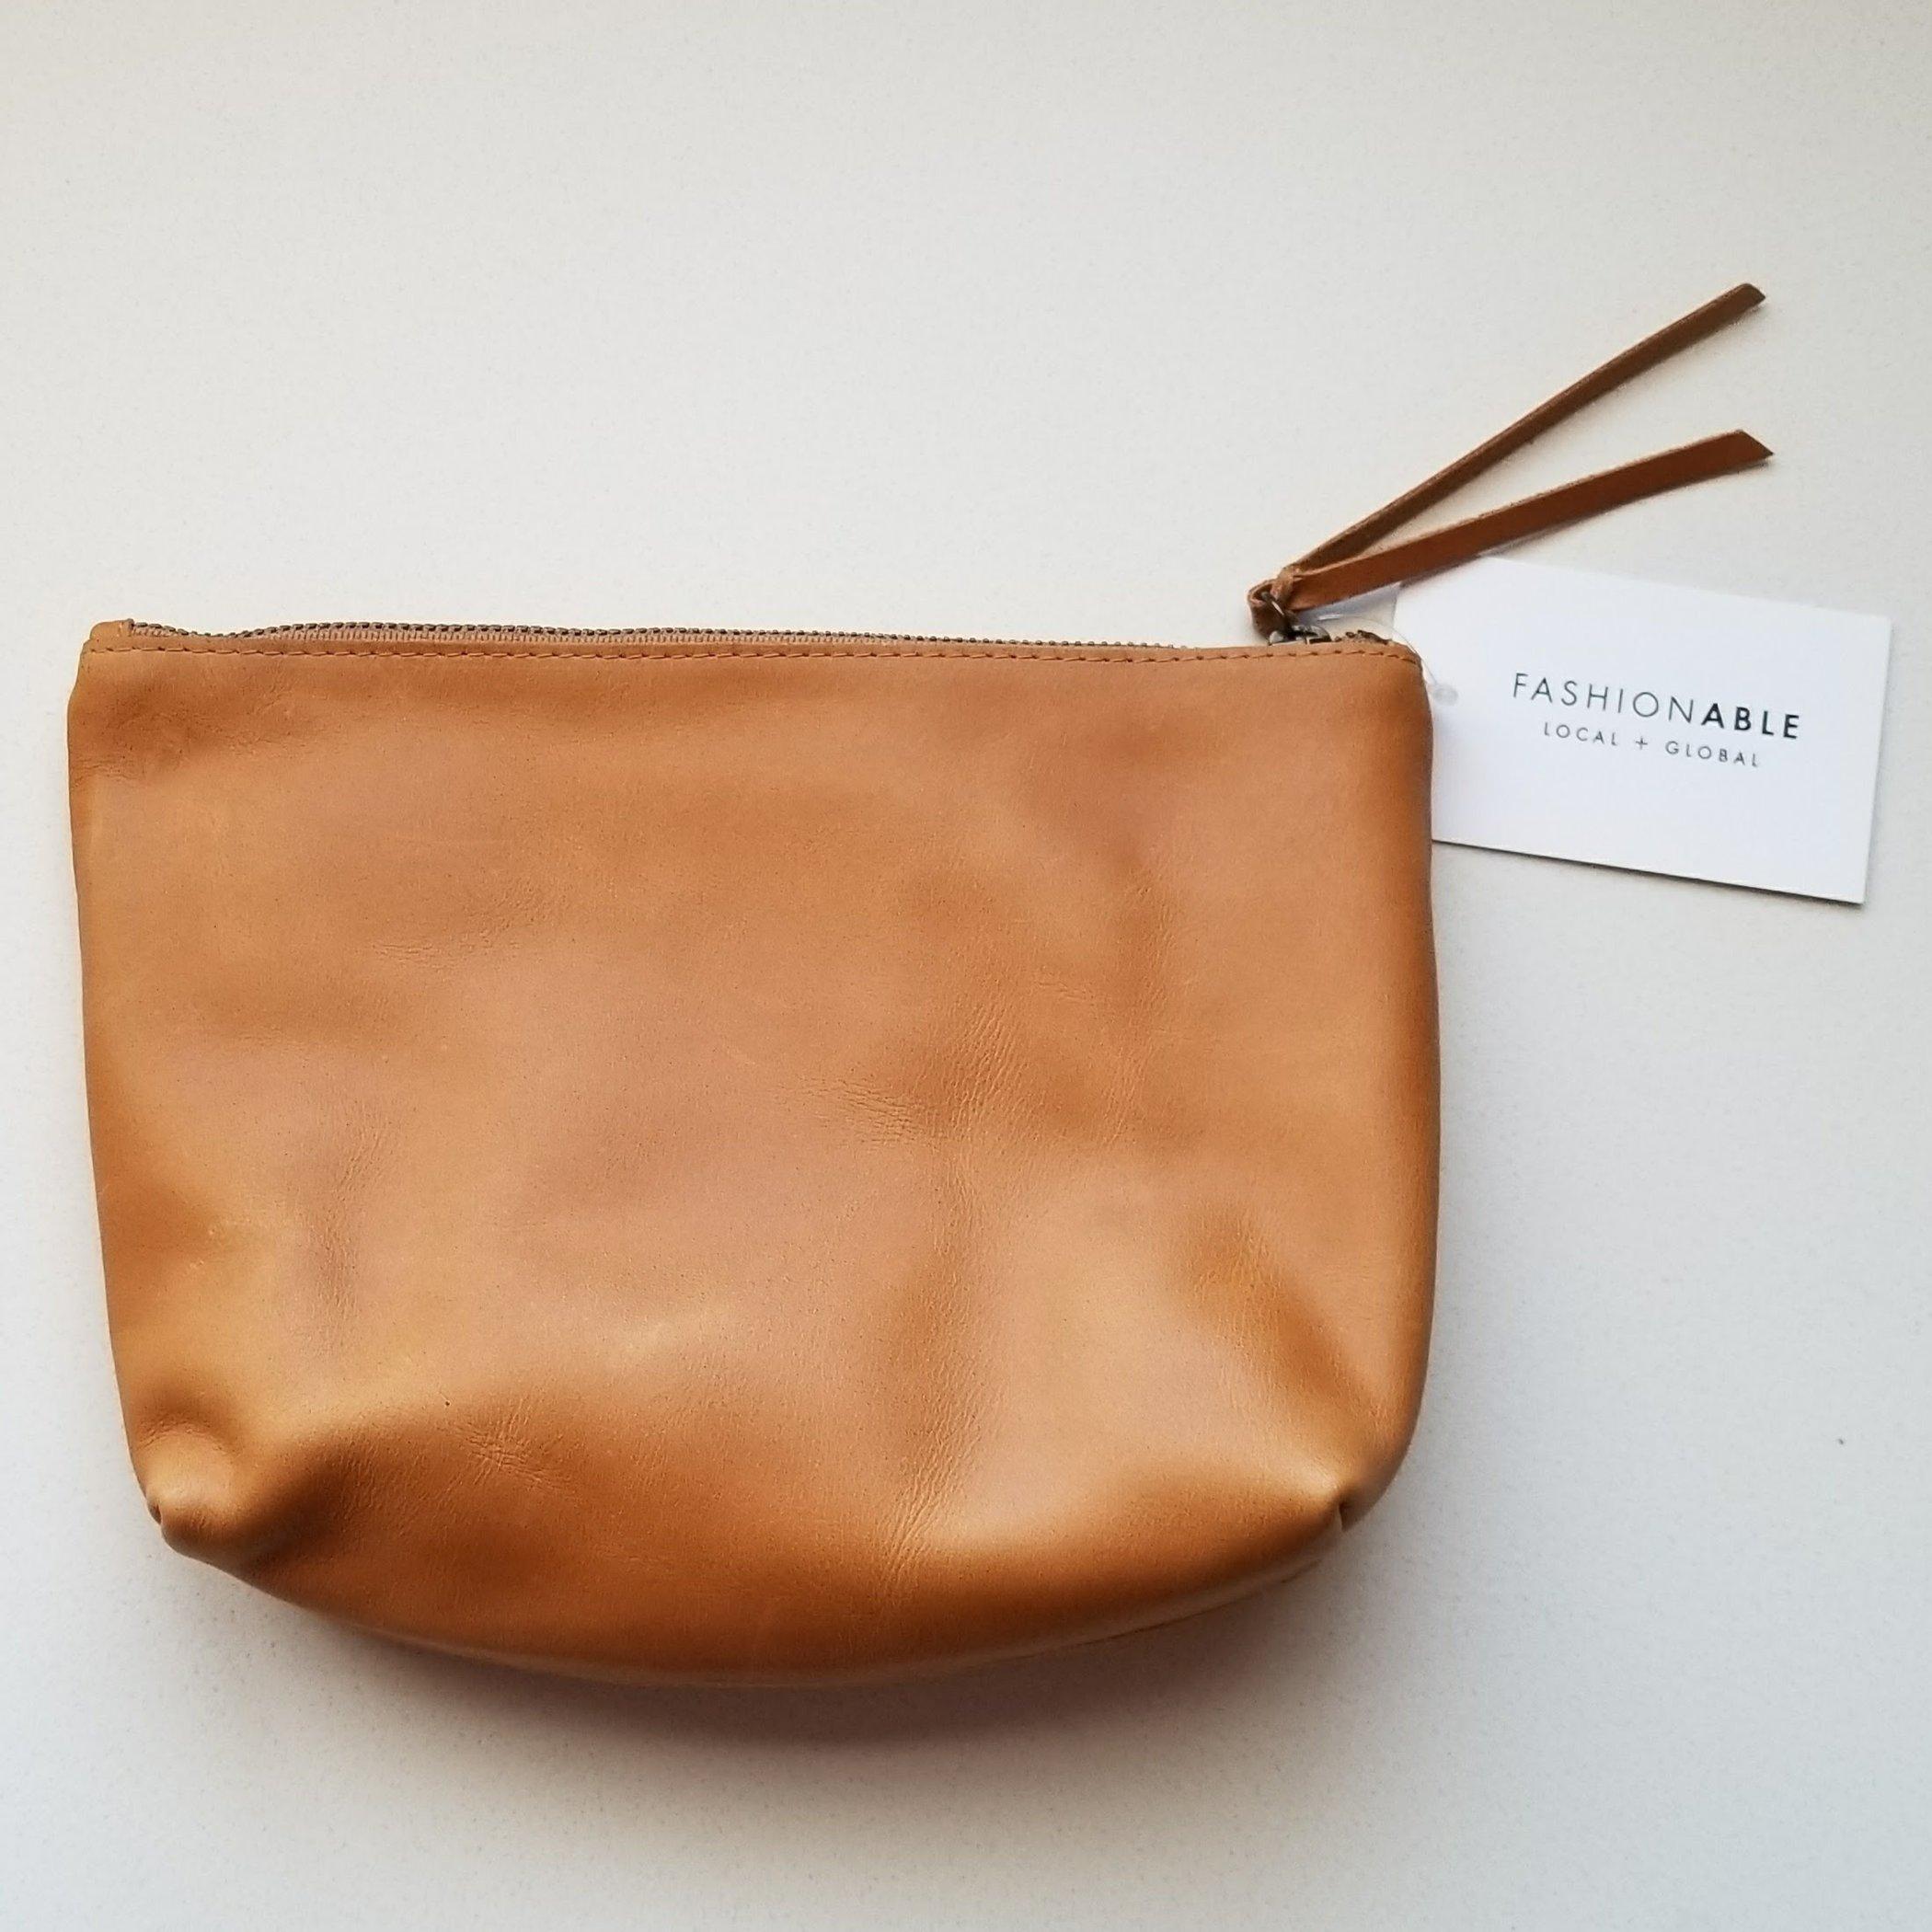 Emnet Pouch in Cognac | akindboutique.com #TheKindBrands | Fair Trade Leather Bag